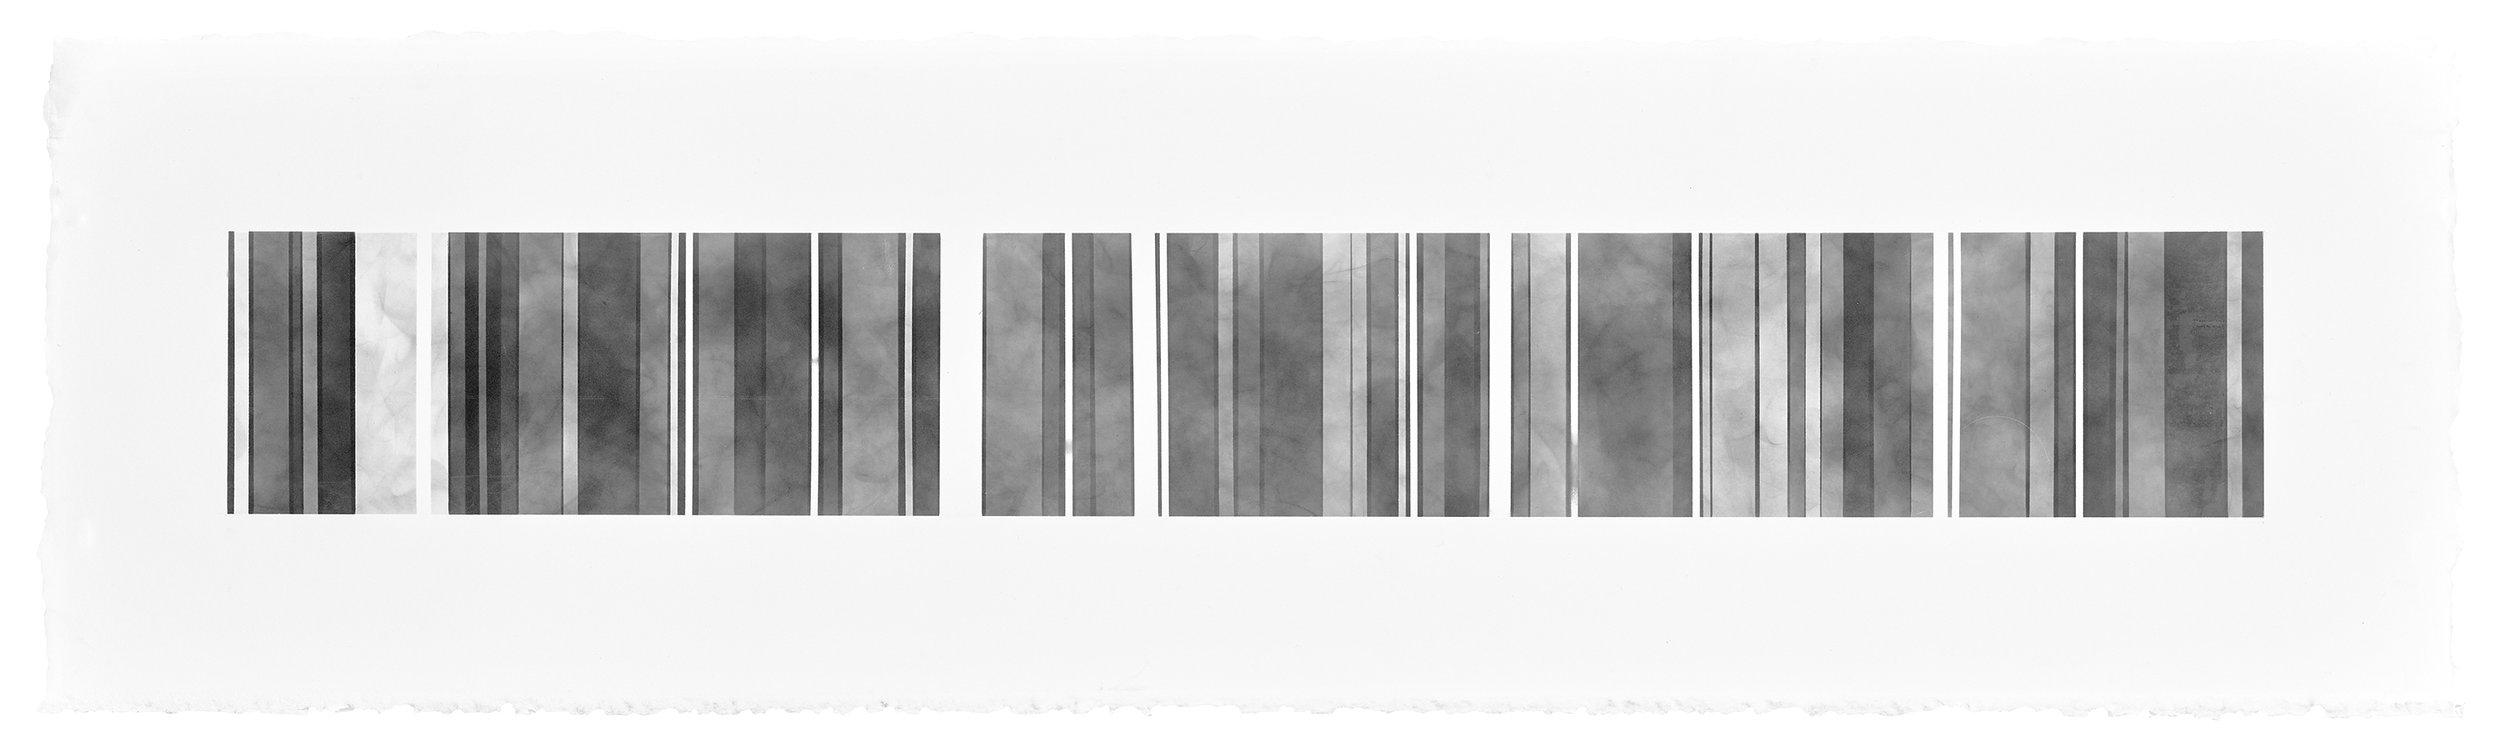 Barcode Series D 2, 2018 copy.jpg